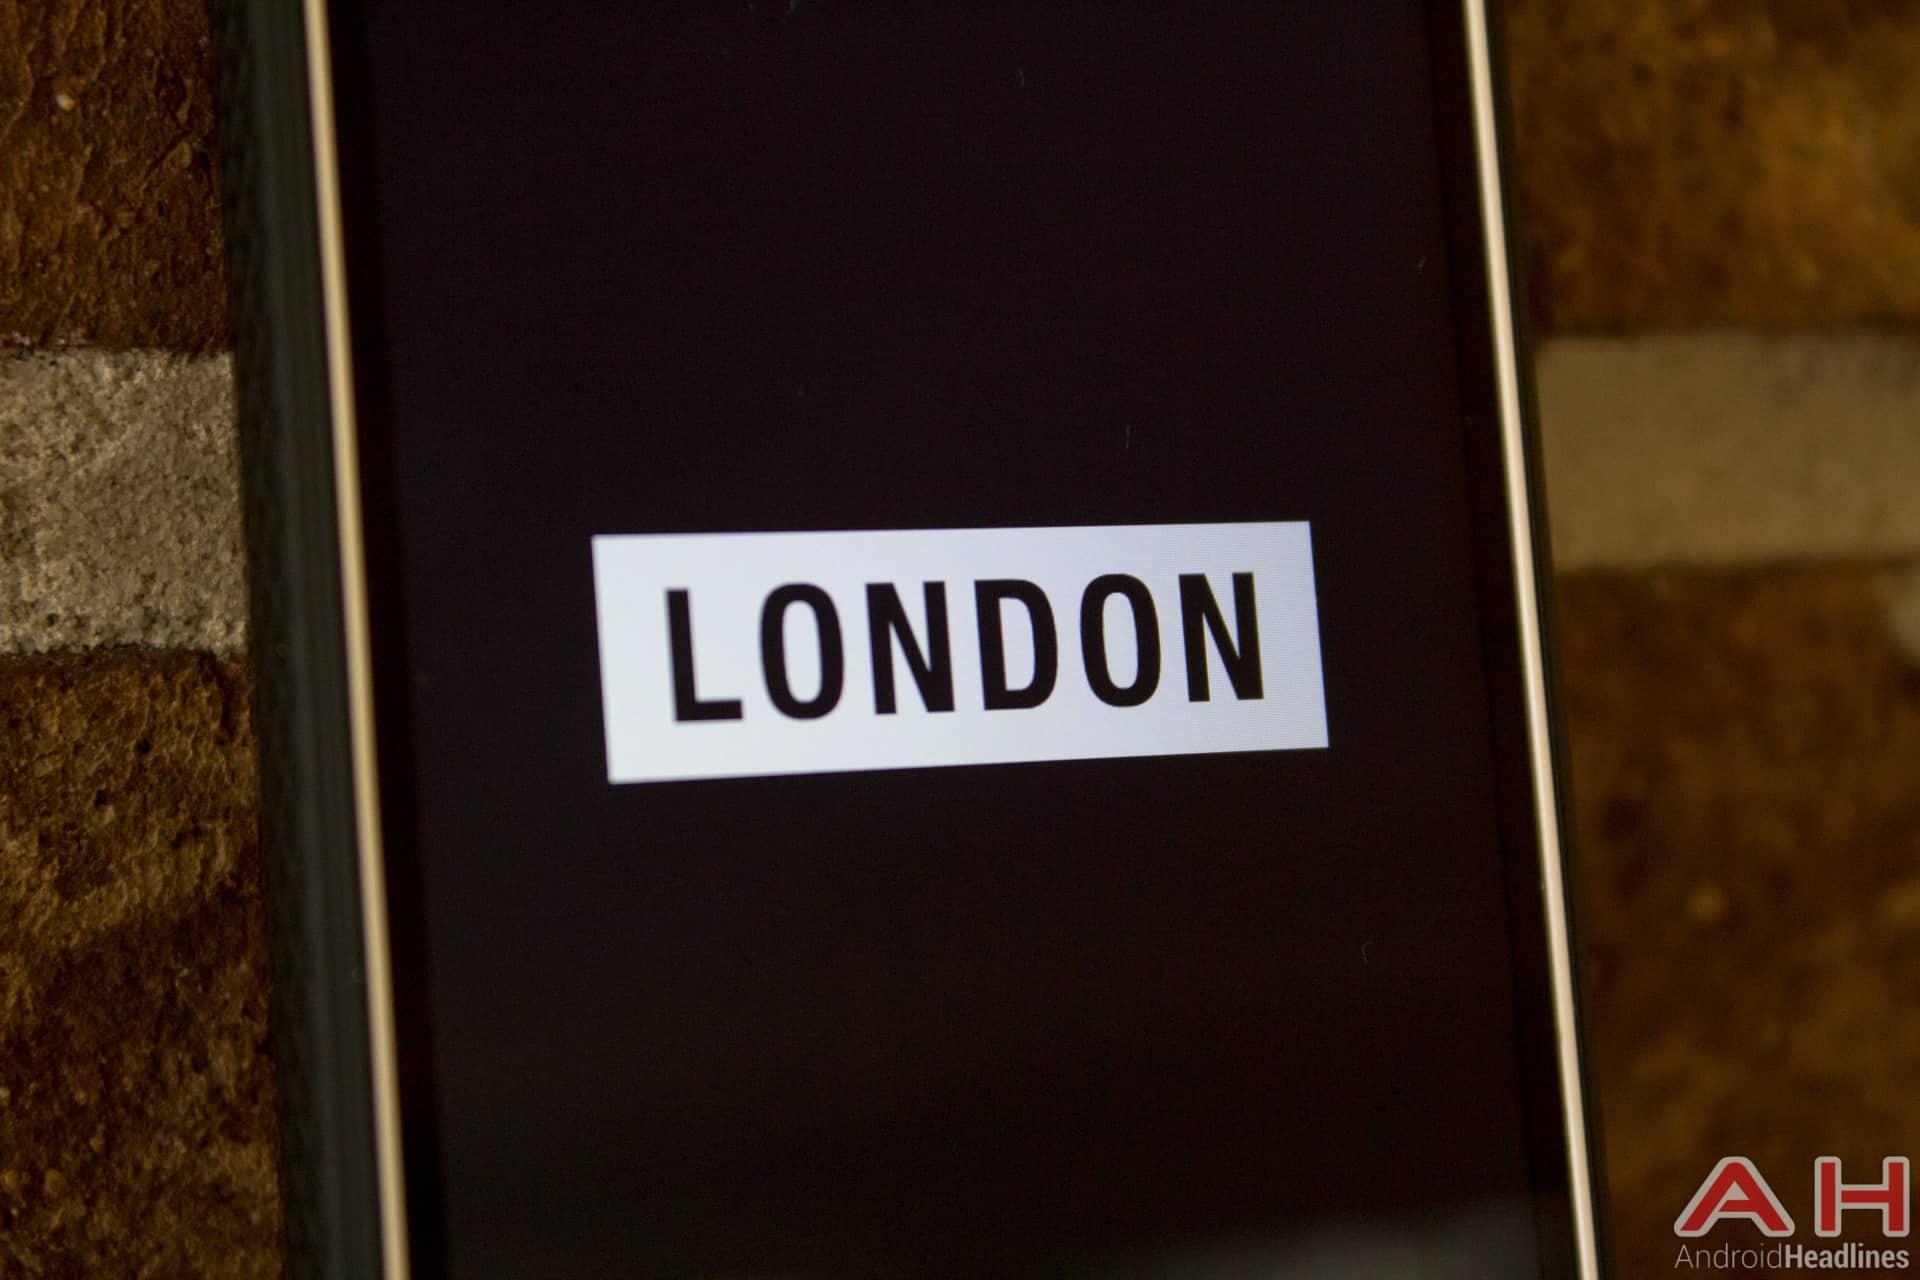 Marshall-London-AH-logo-2